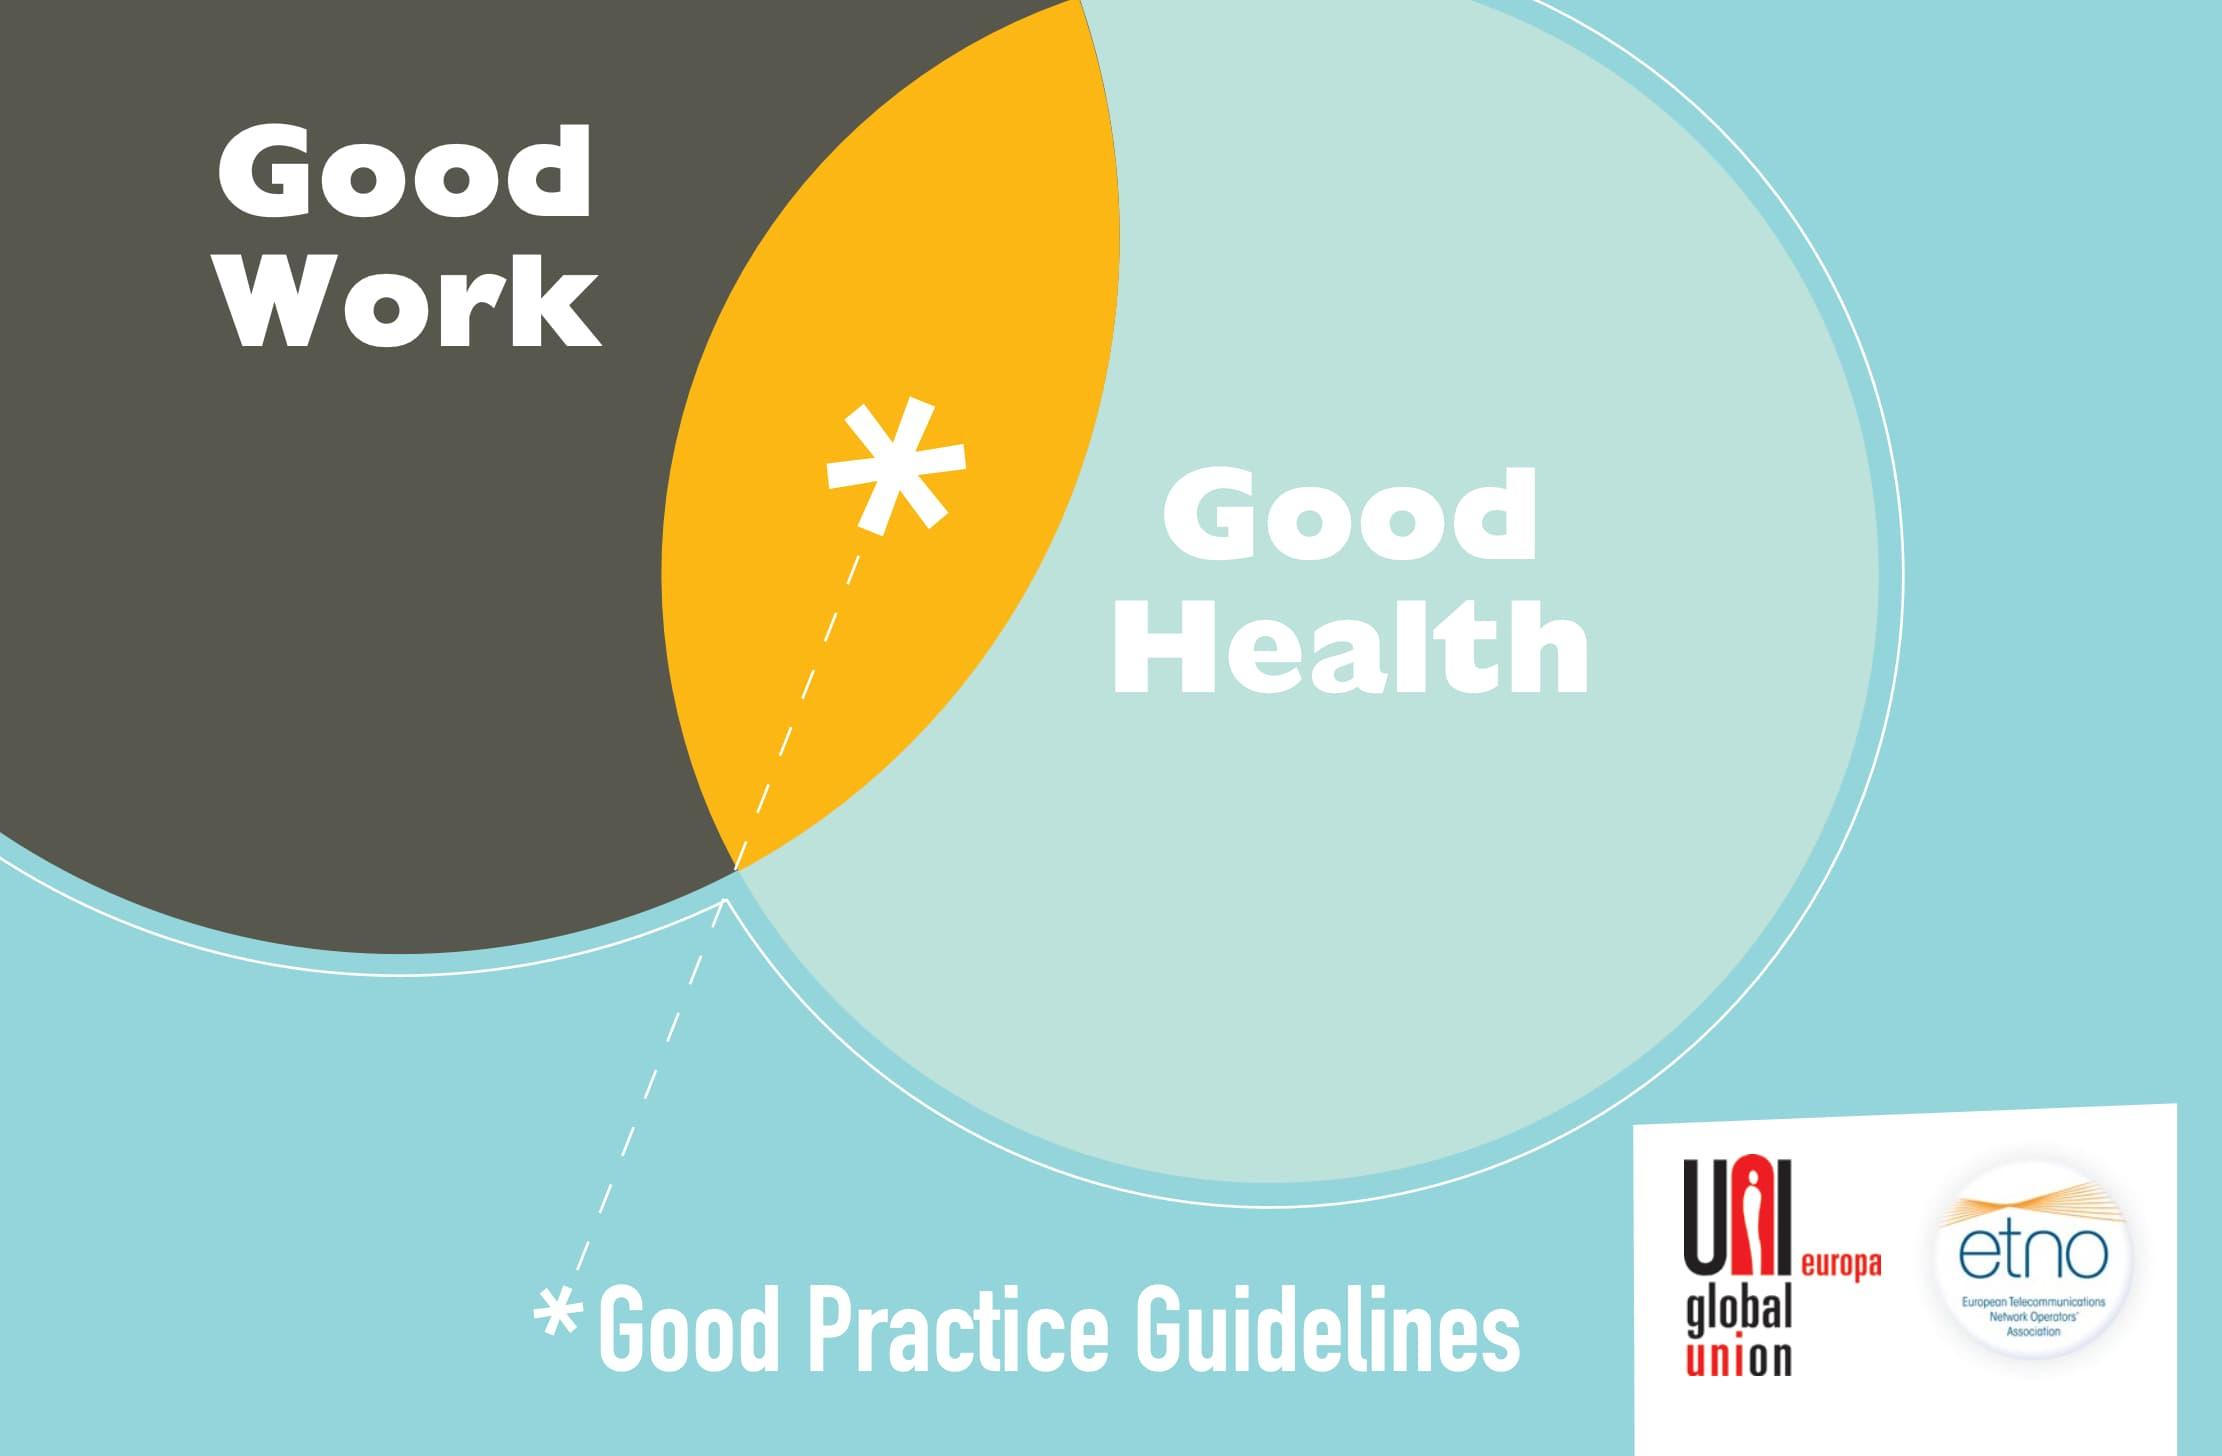 Good Work Good Health